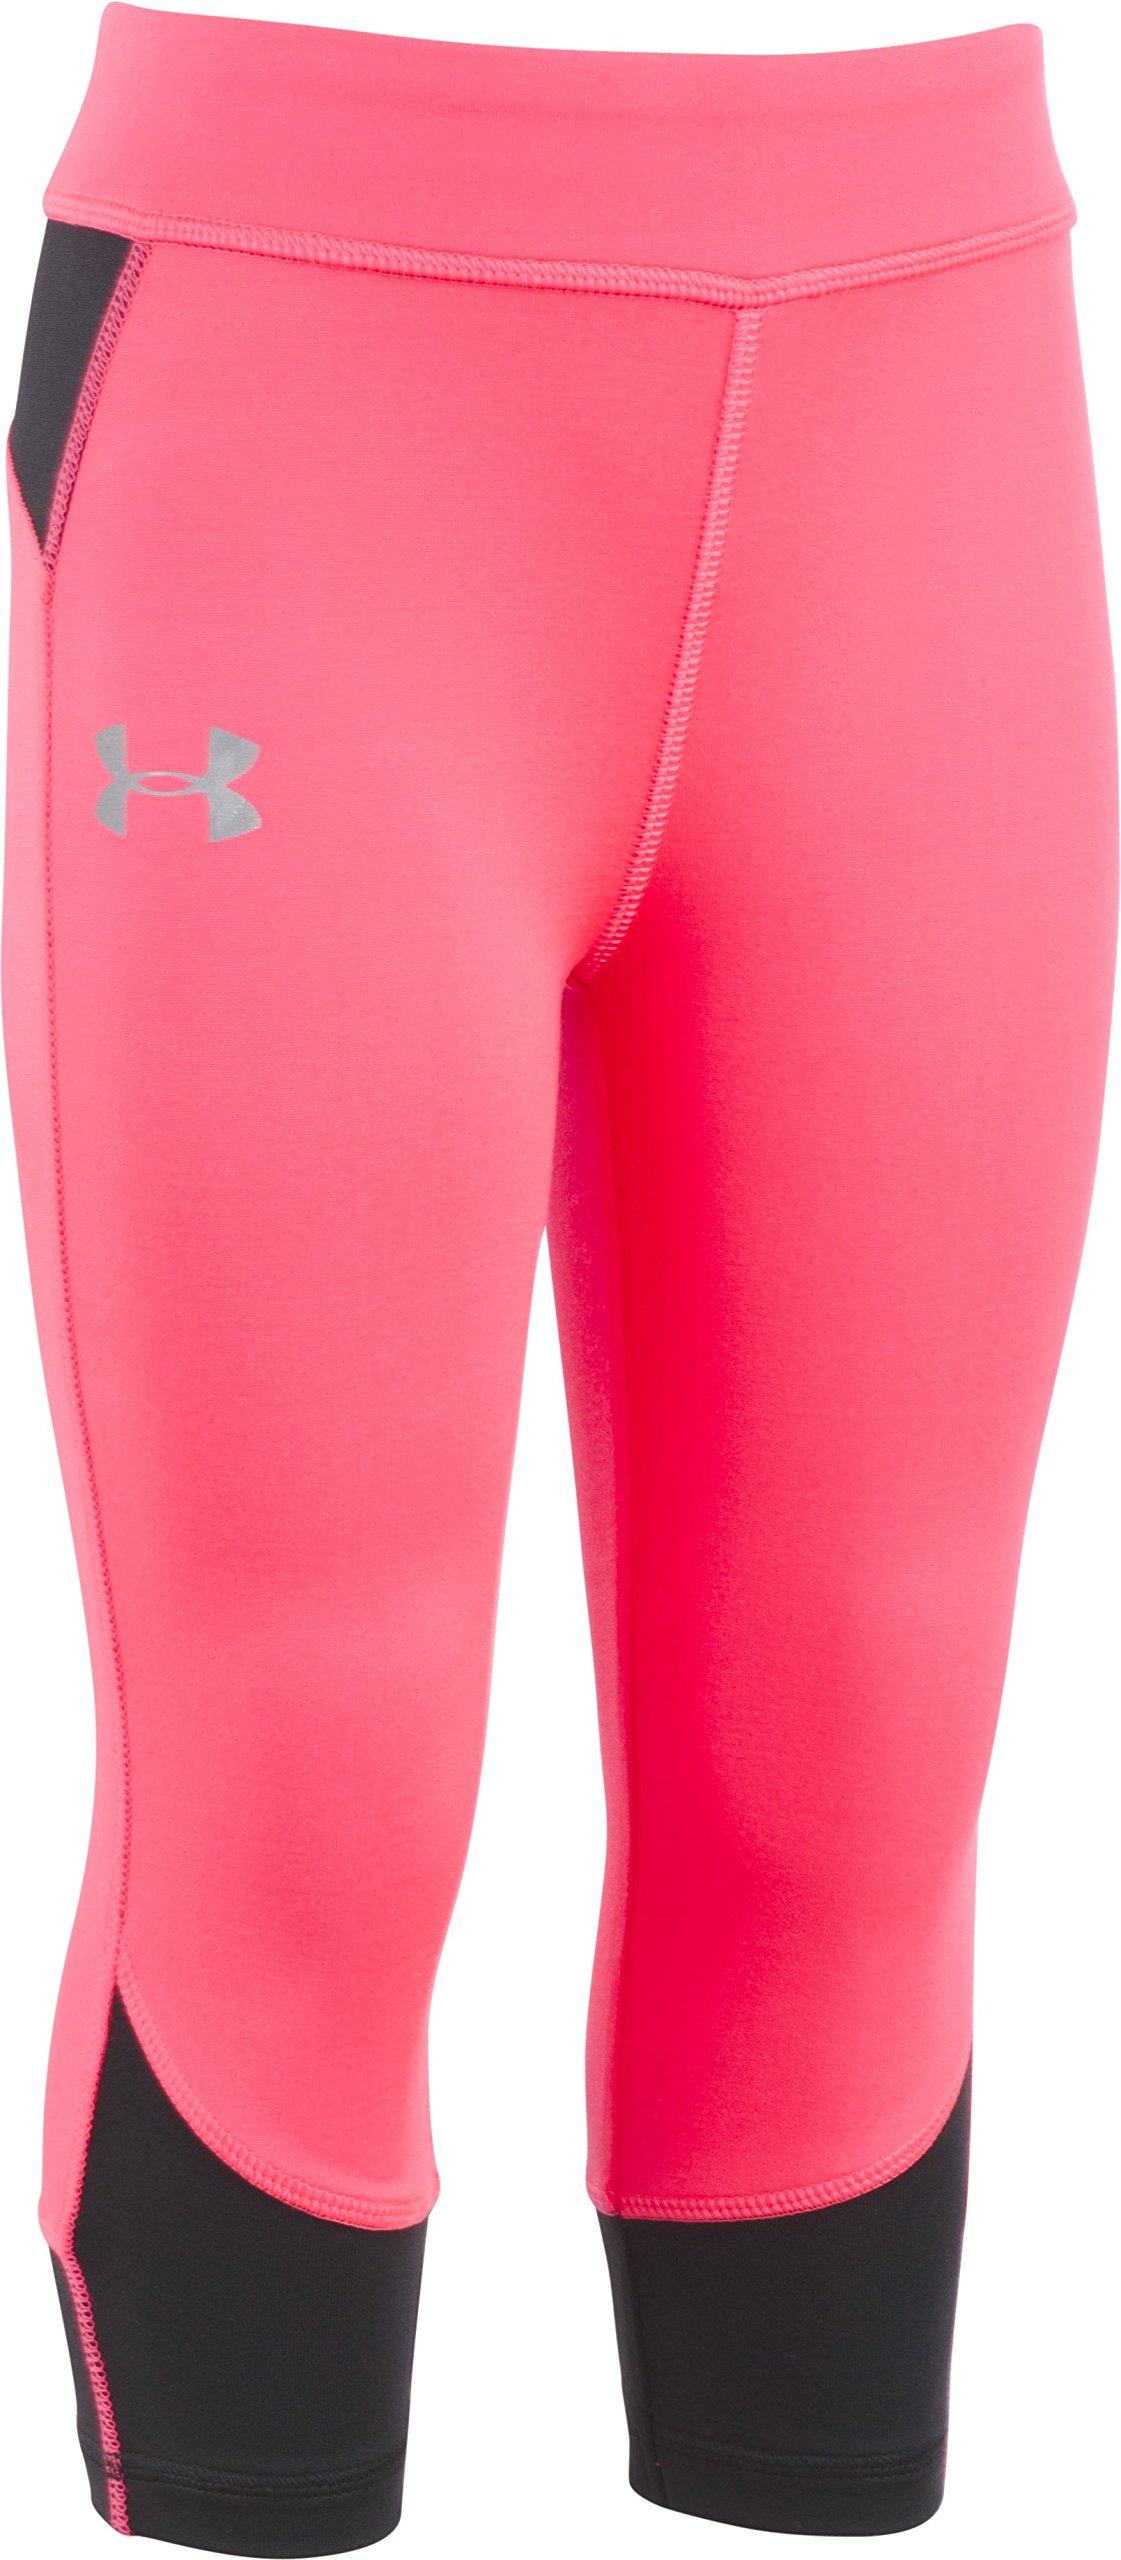 Under Armour Little Girls' Core Active Capri Legging, Penta Pink, 6